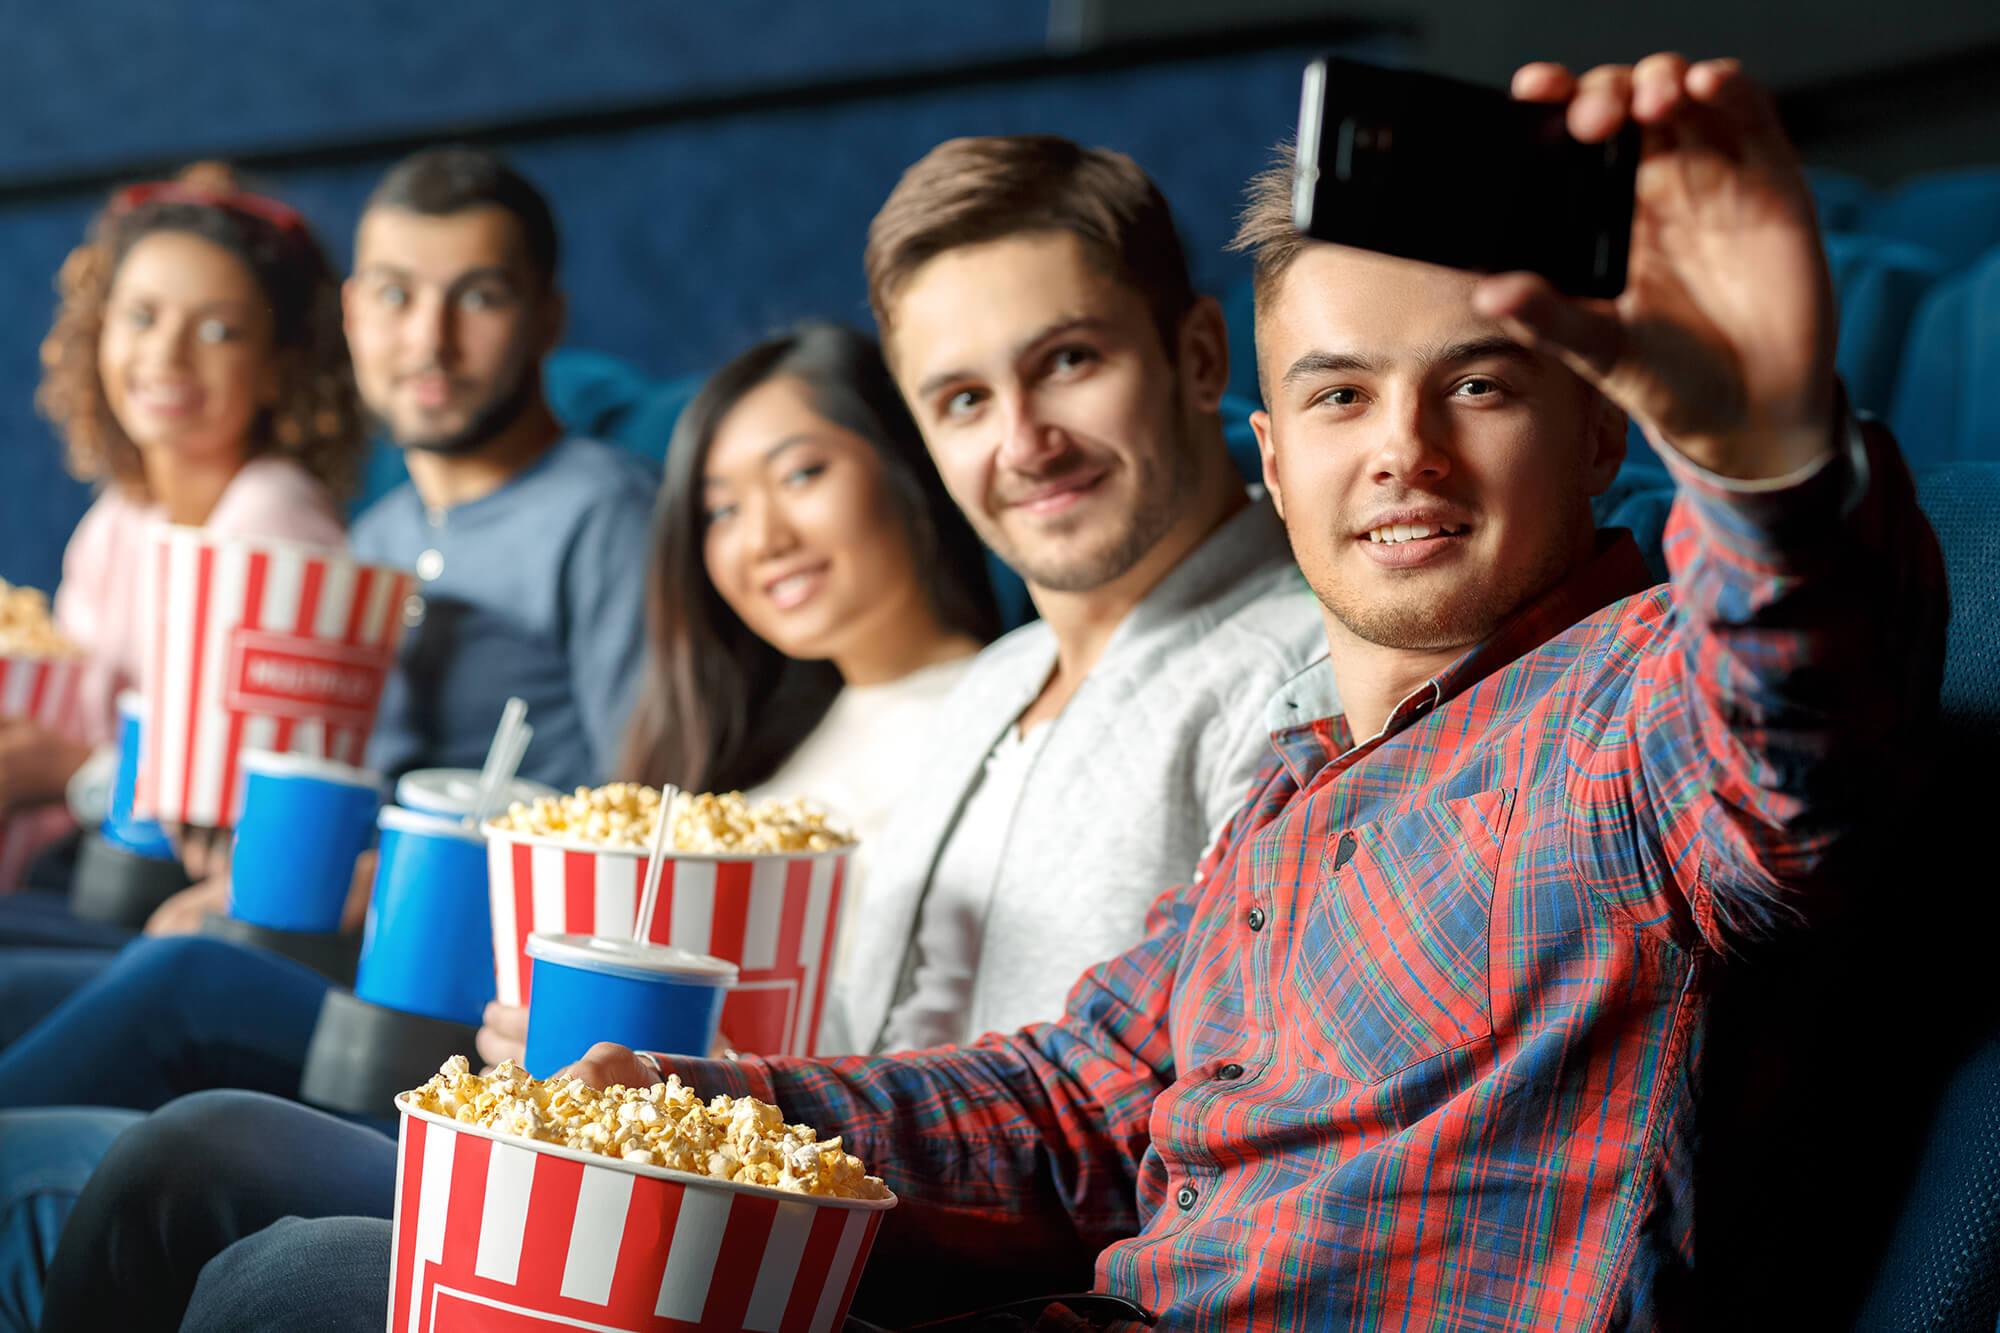 A group take a selfie in a cinema screen